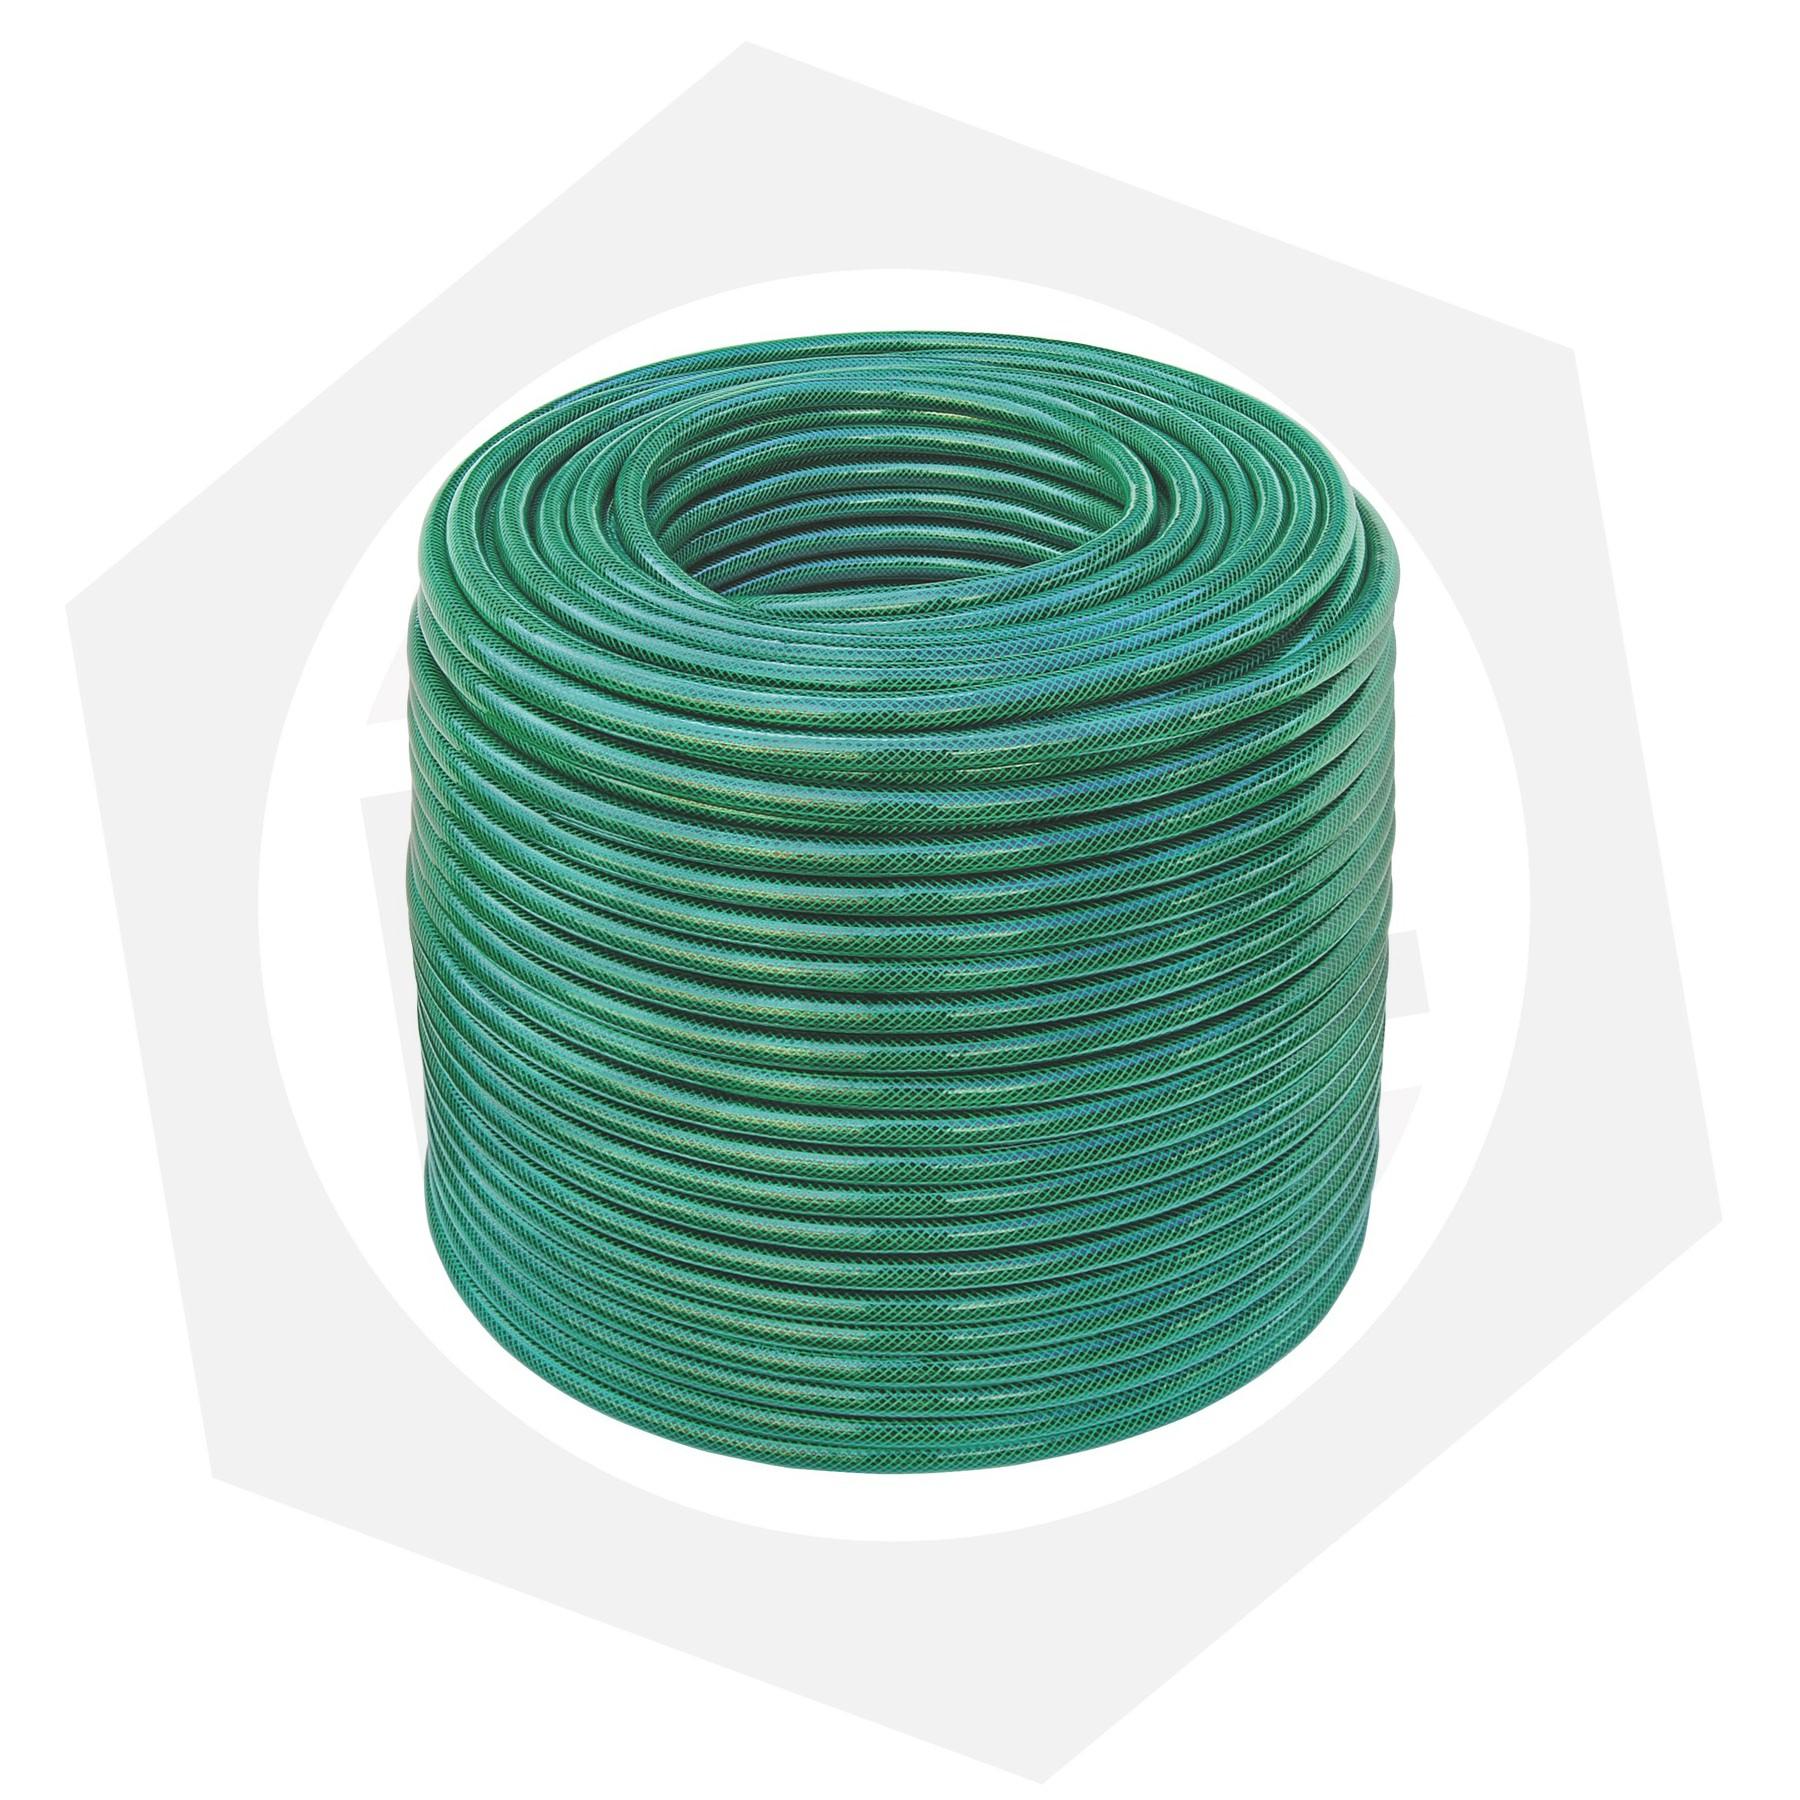 "Caño Riego Flexible Tramontina 79190/500 - 3/4"" x 50 m"